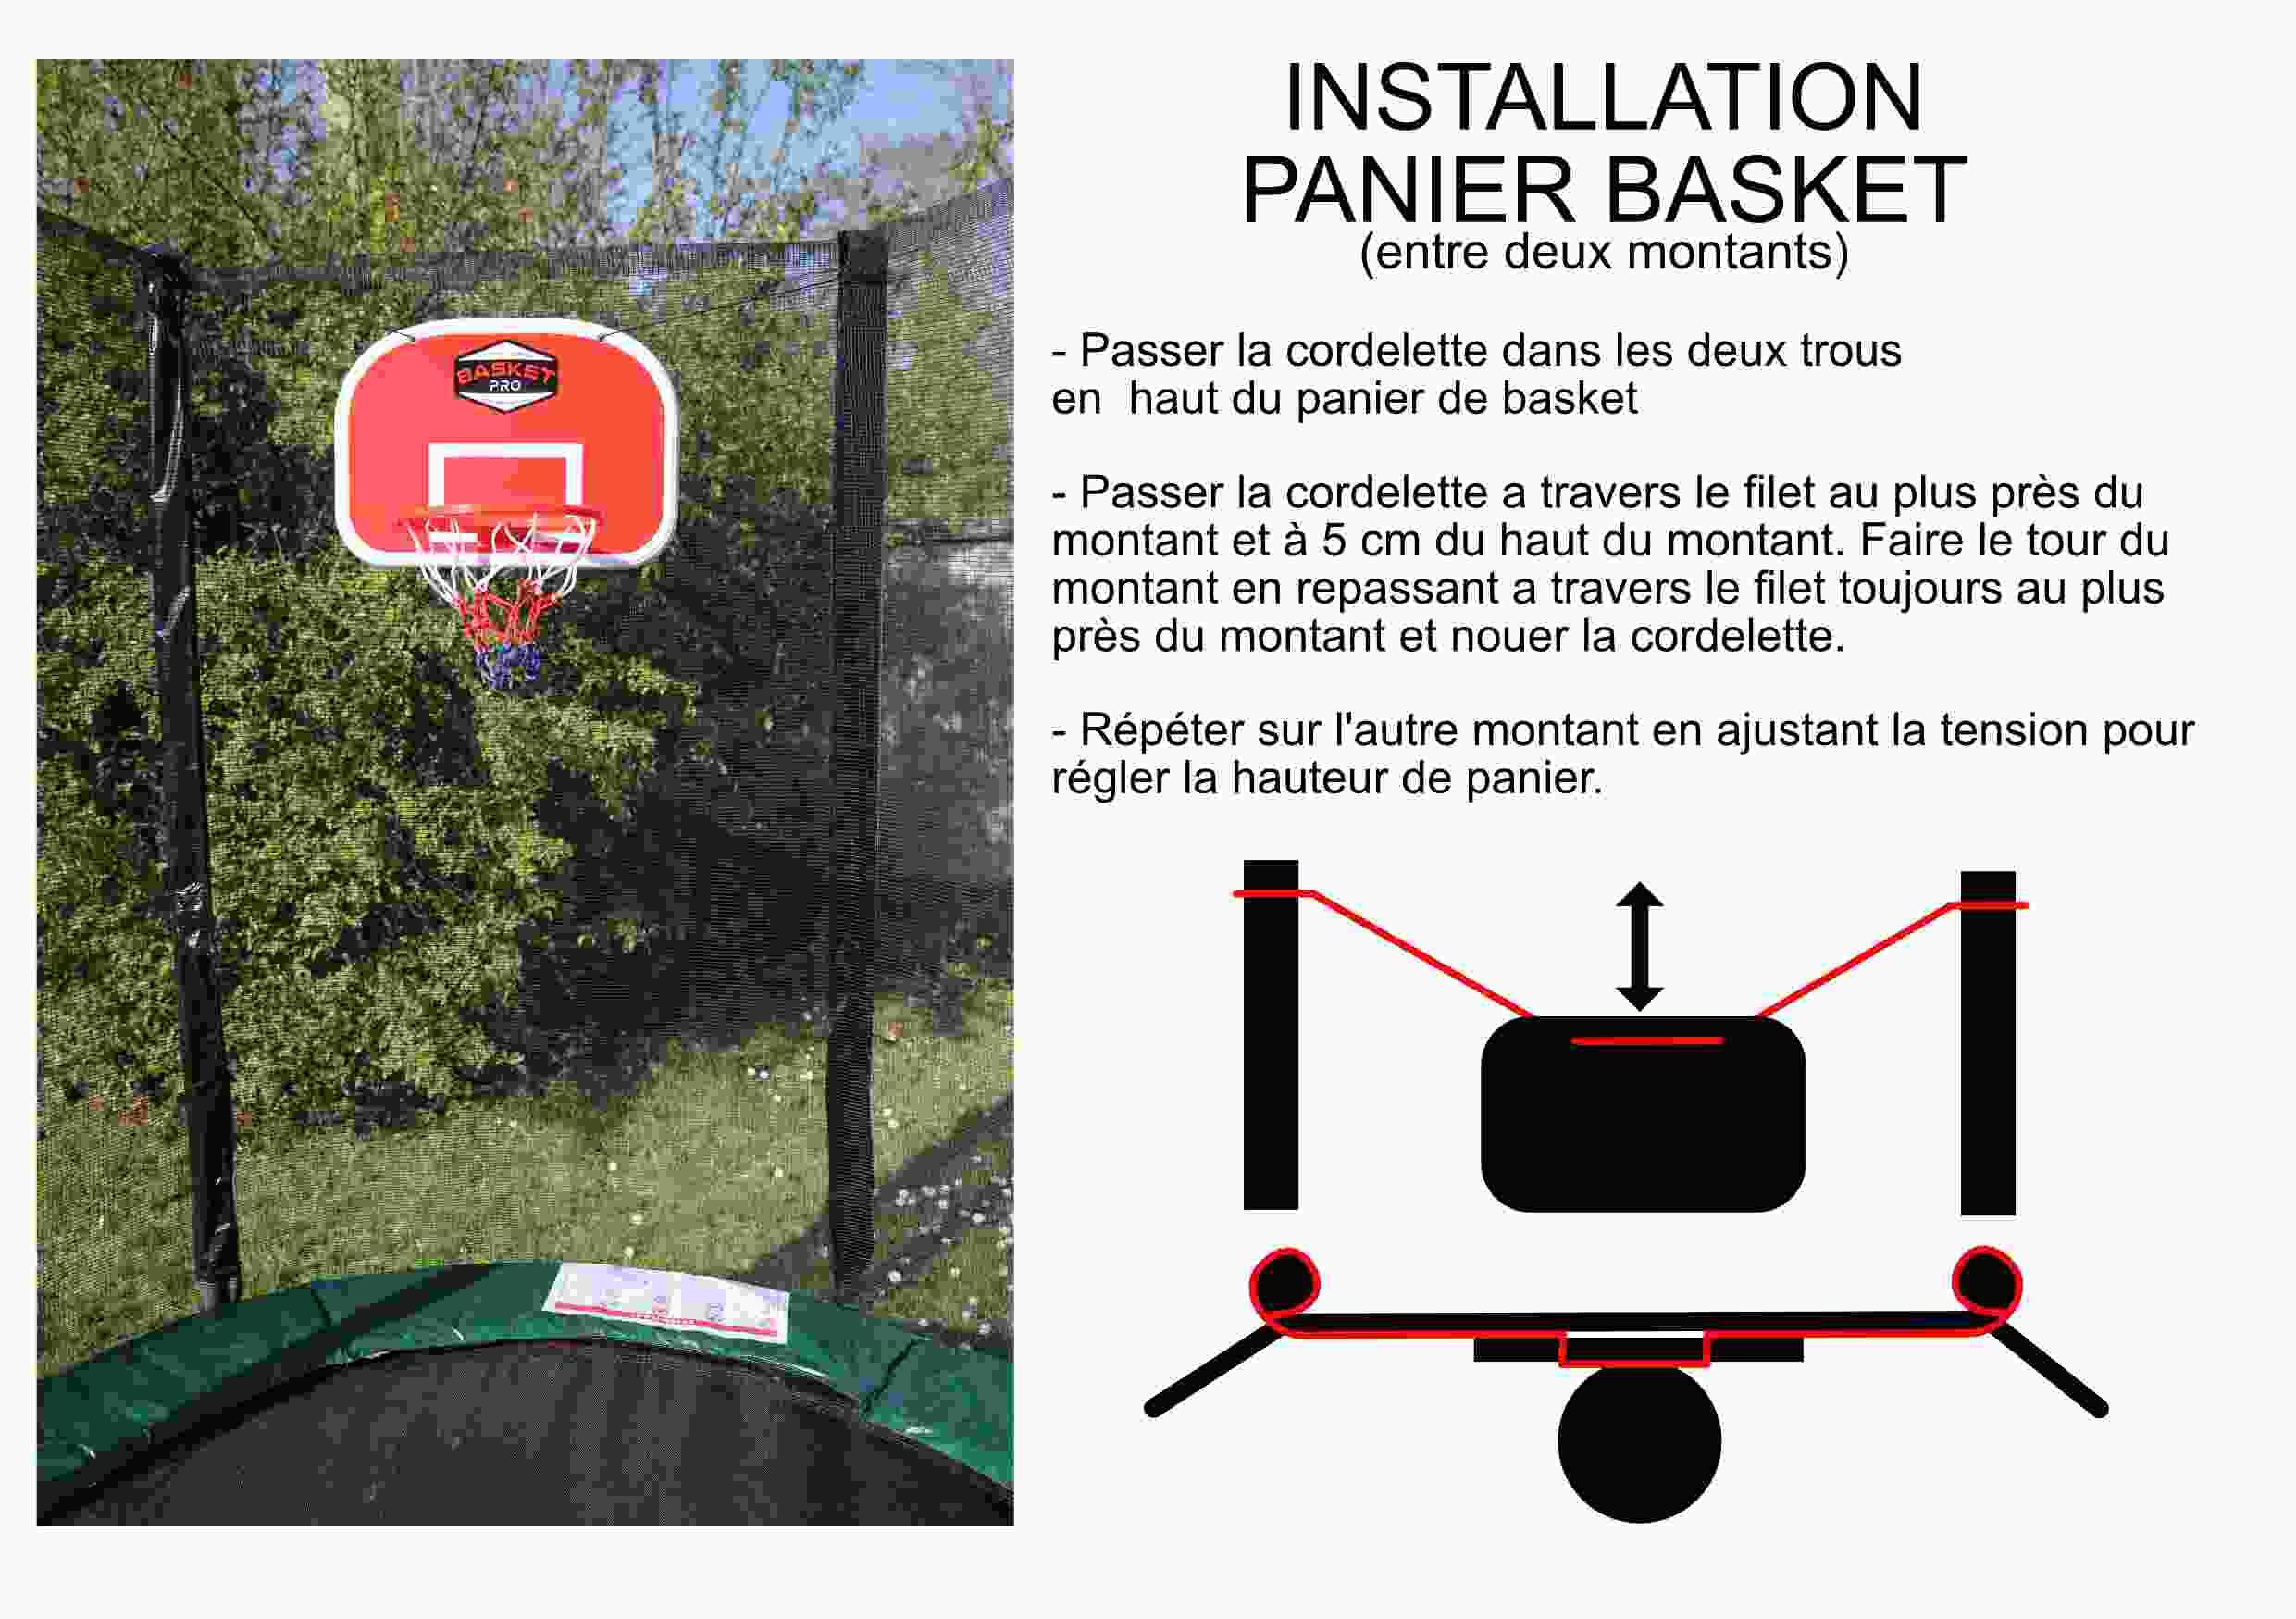 instalation 2.jpg